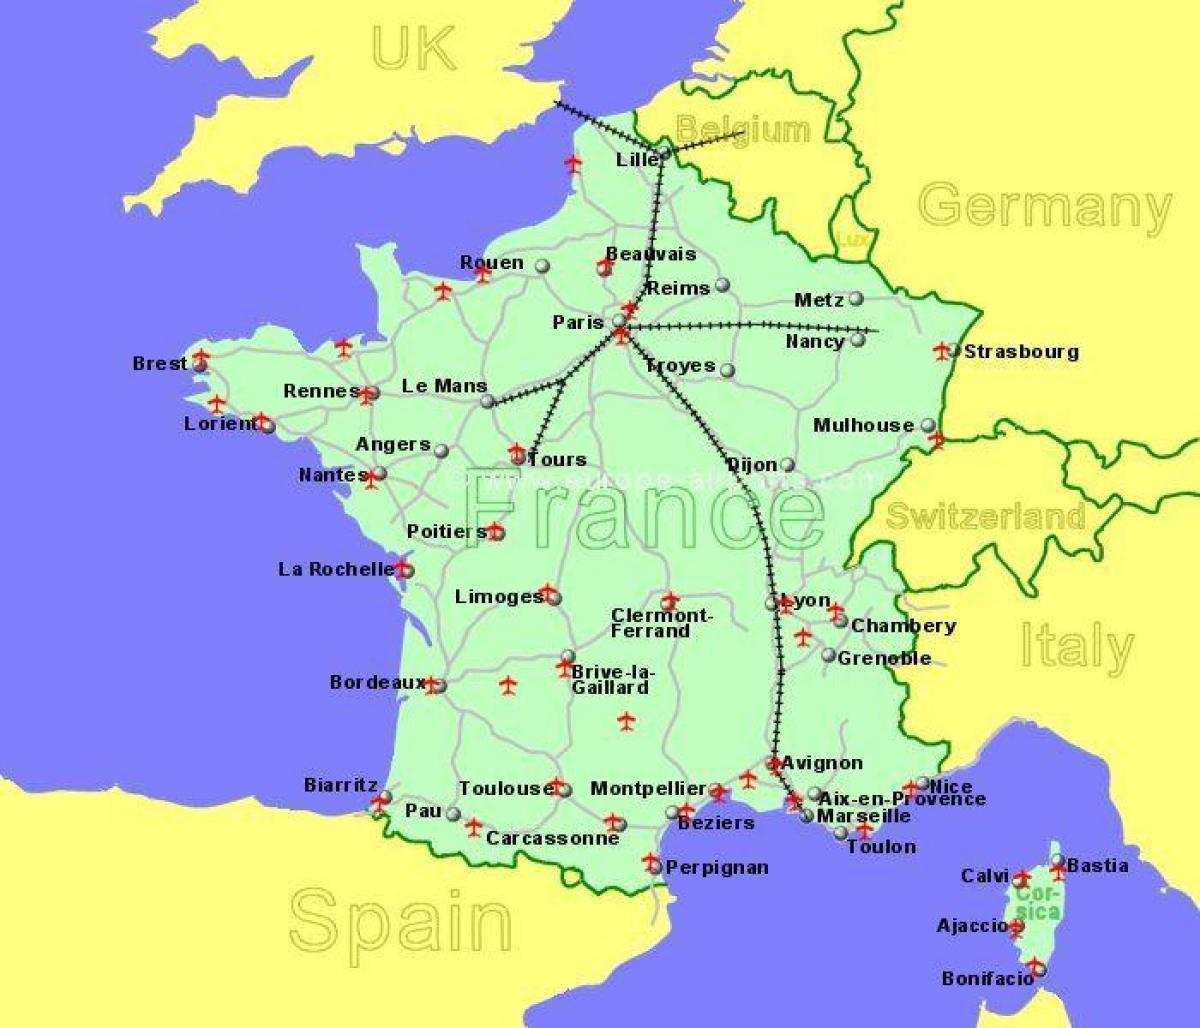 flygplatser i frankrike karta Södra Frankrike flygplatser karta   Flygplatser södra Frankrike  flygplatser i frankrike karta